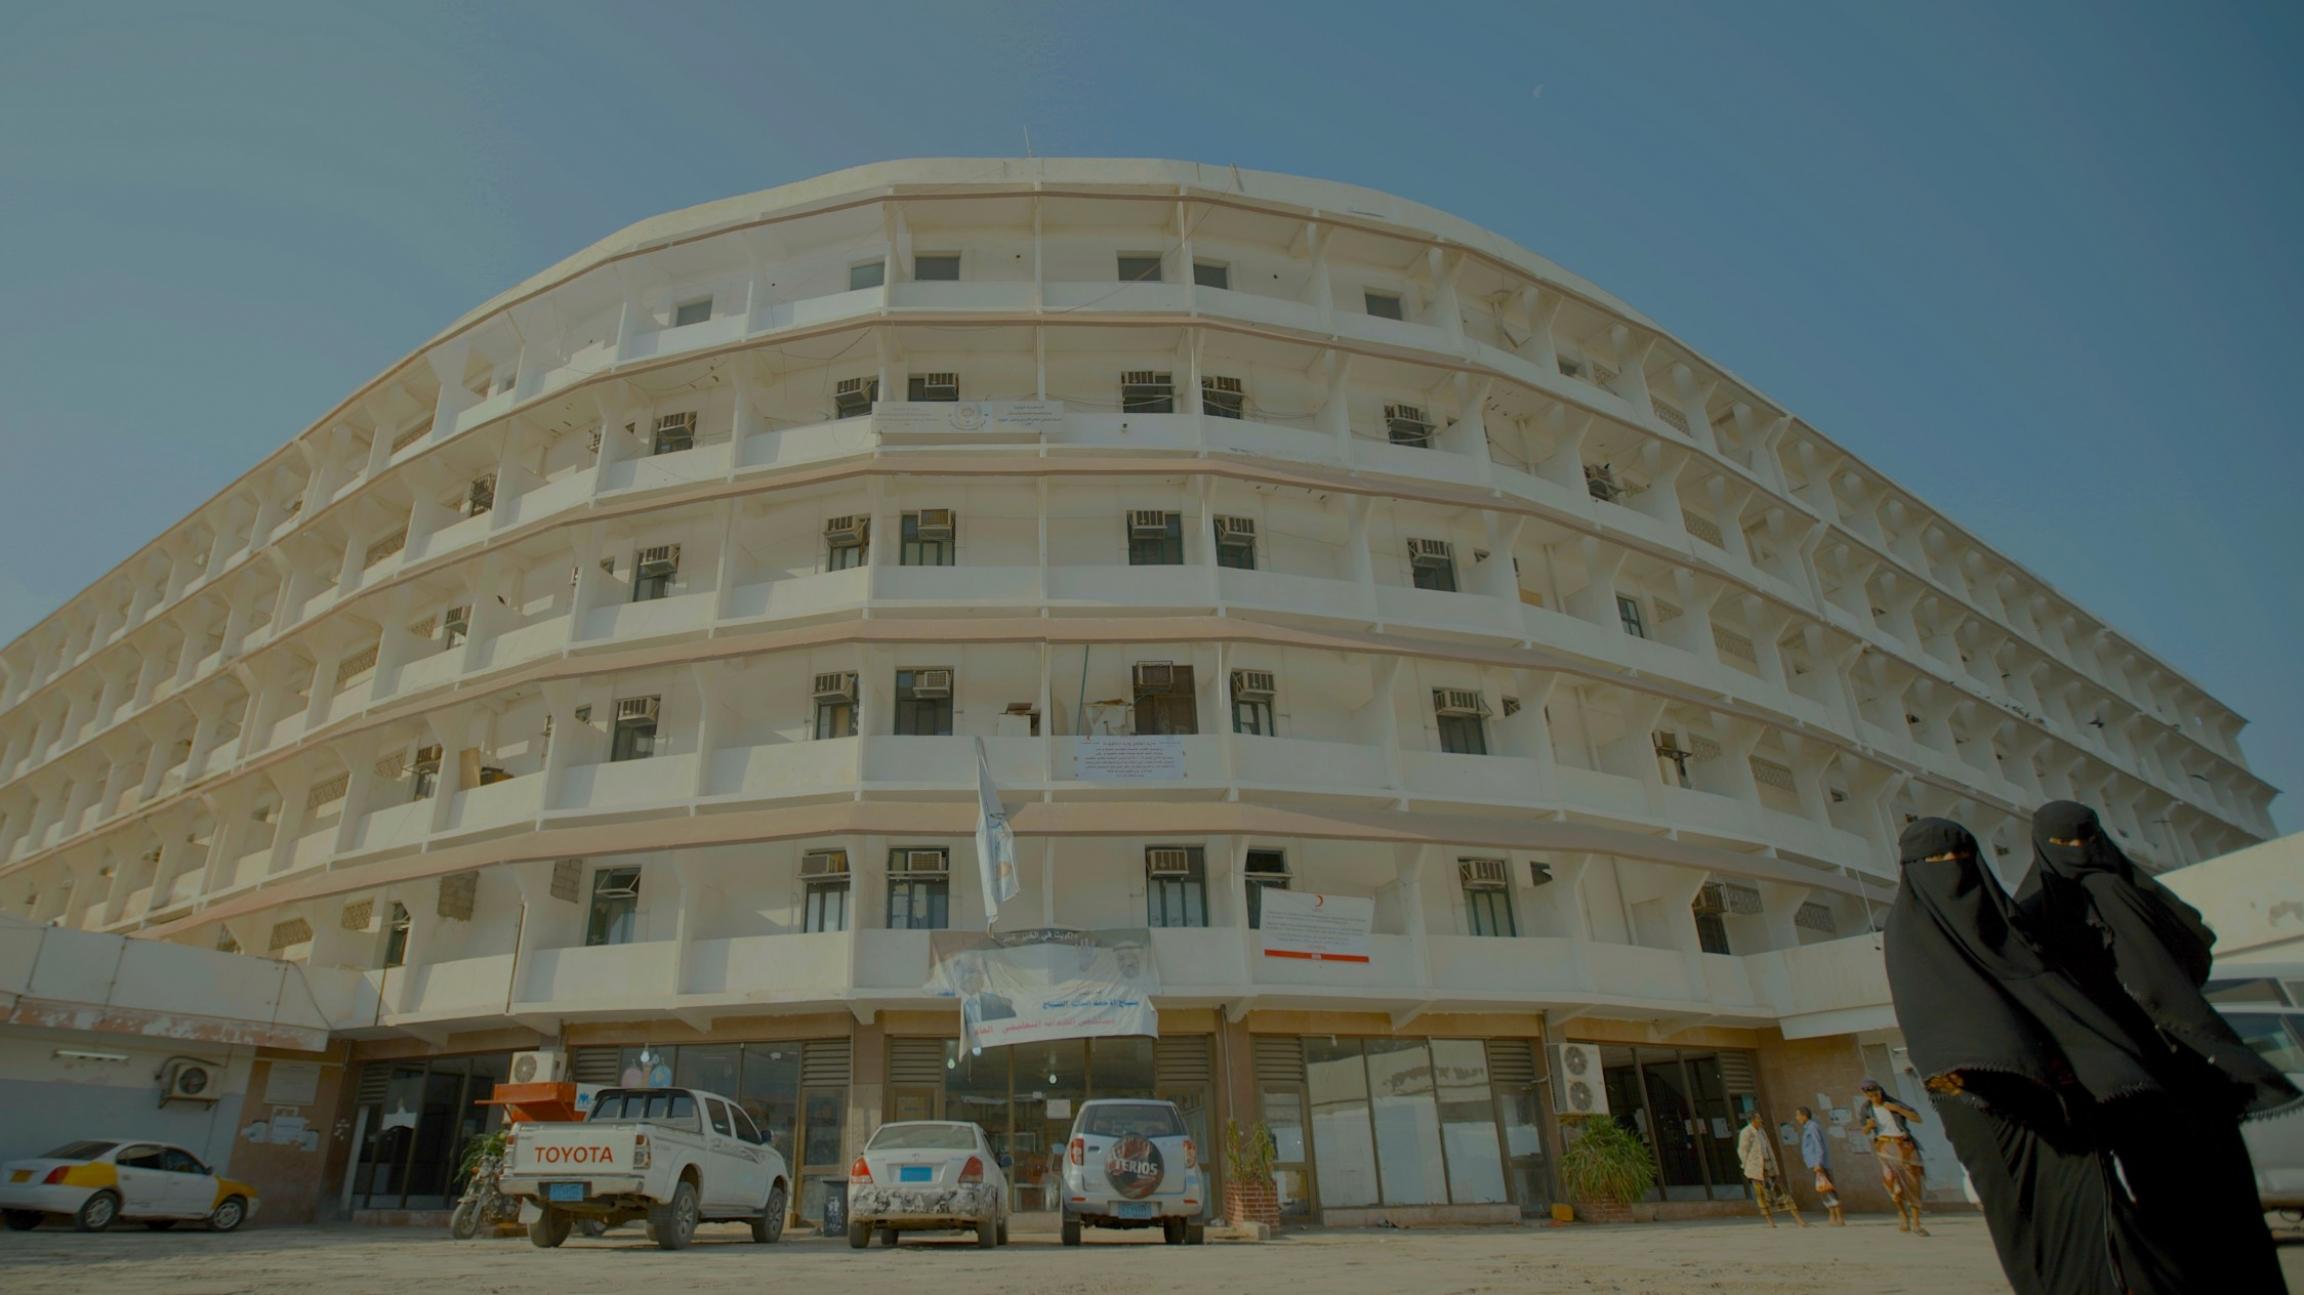 Sadaqa Hospital, as seen from the street